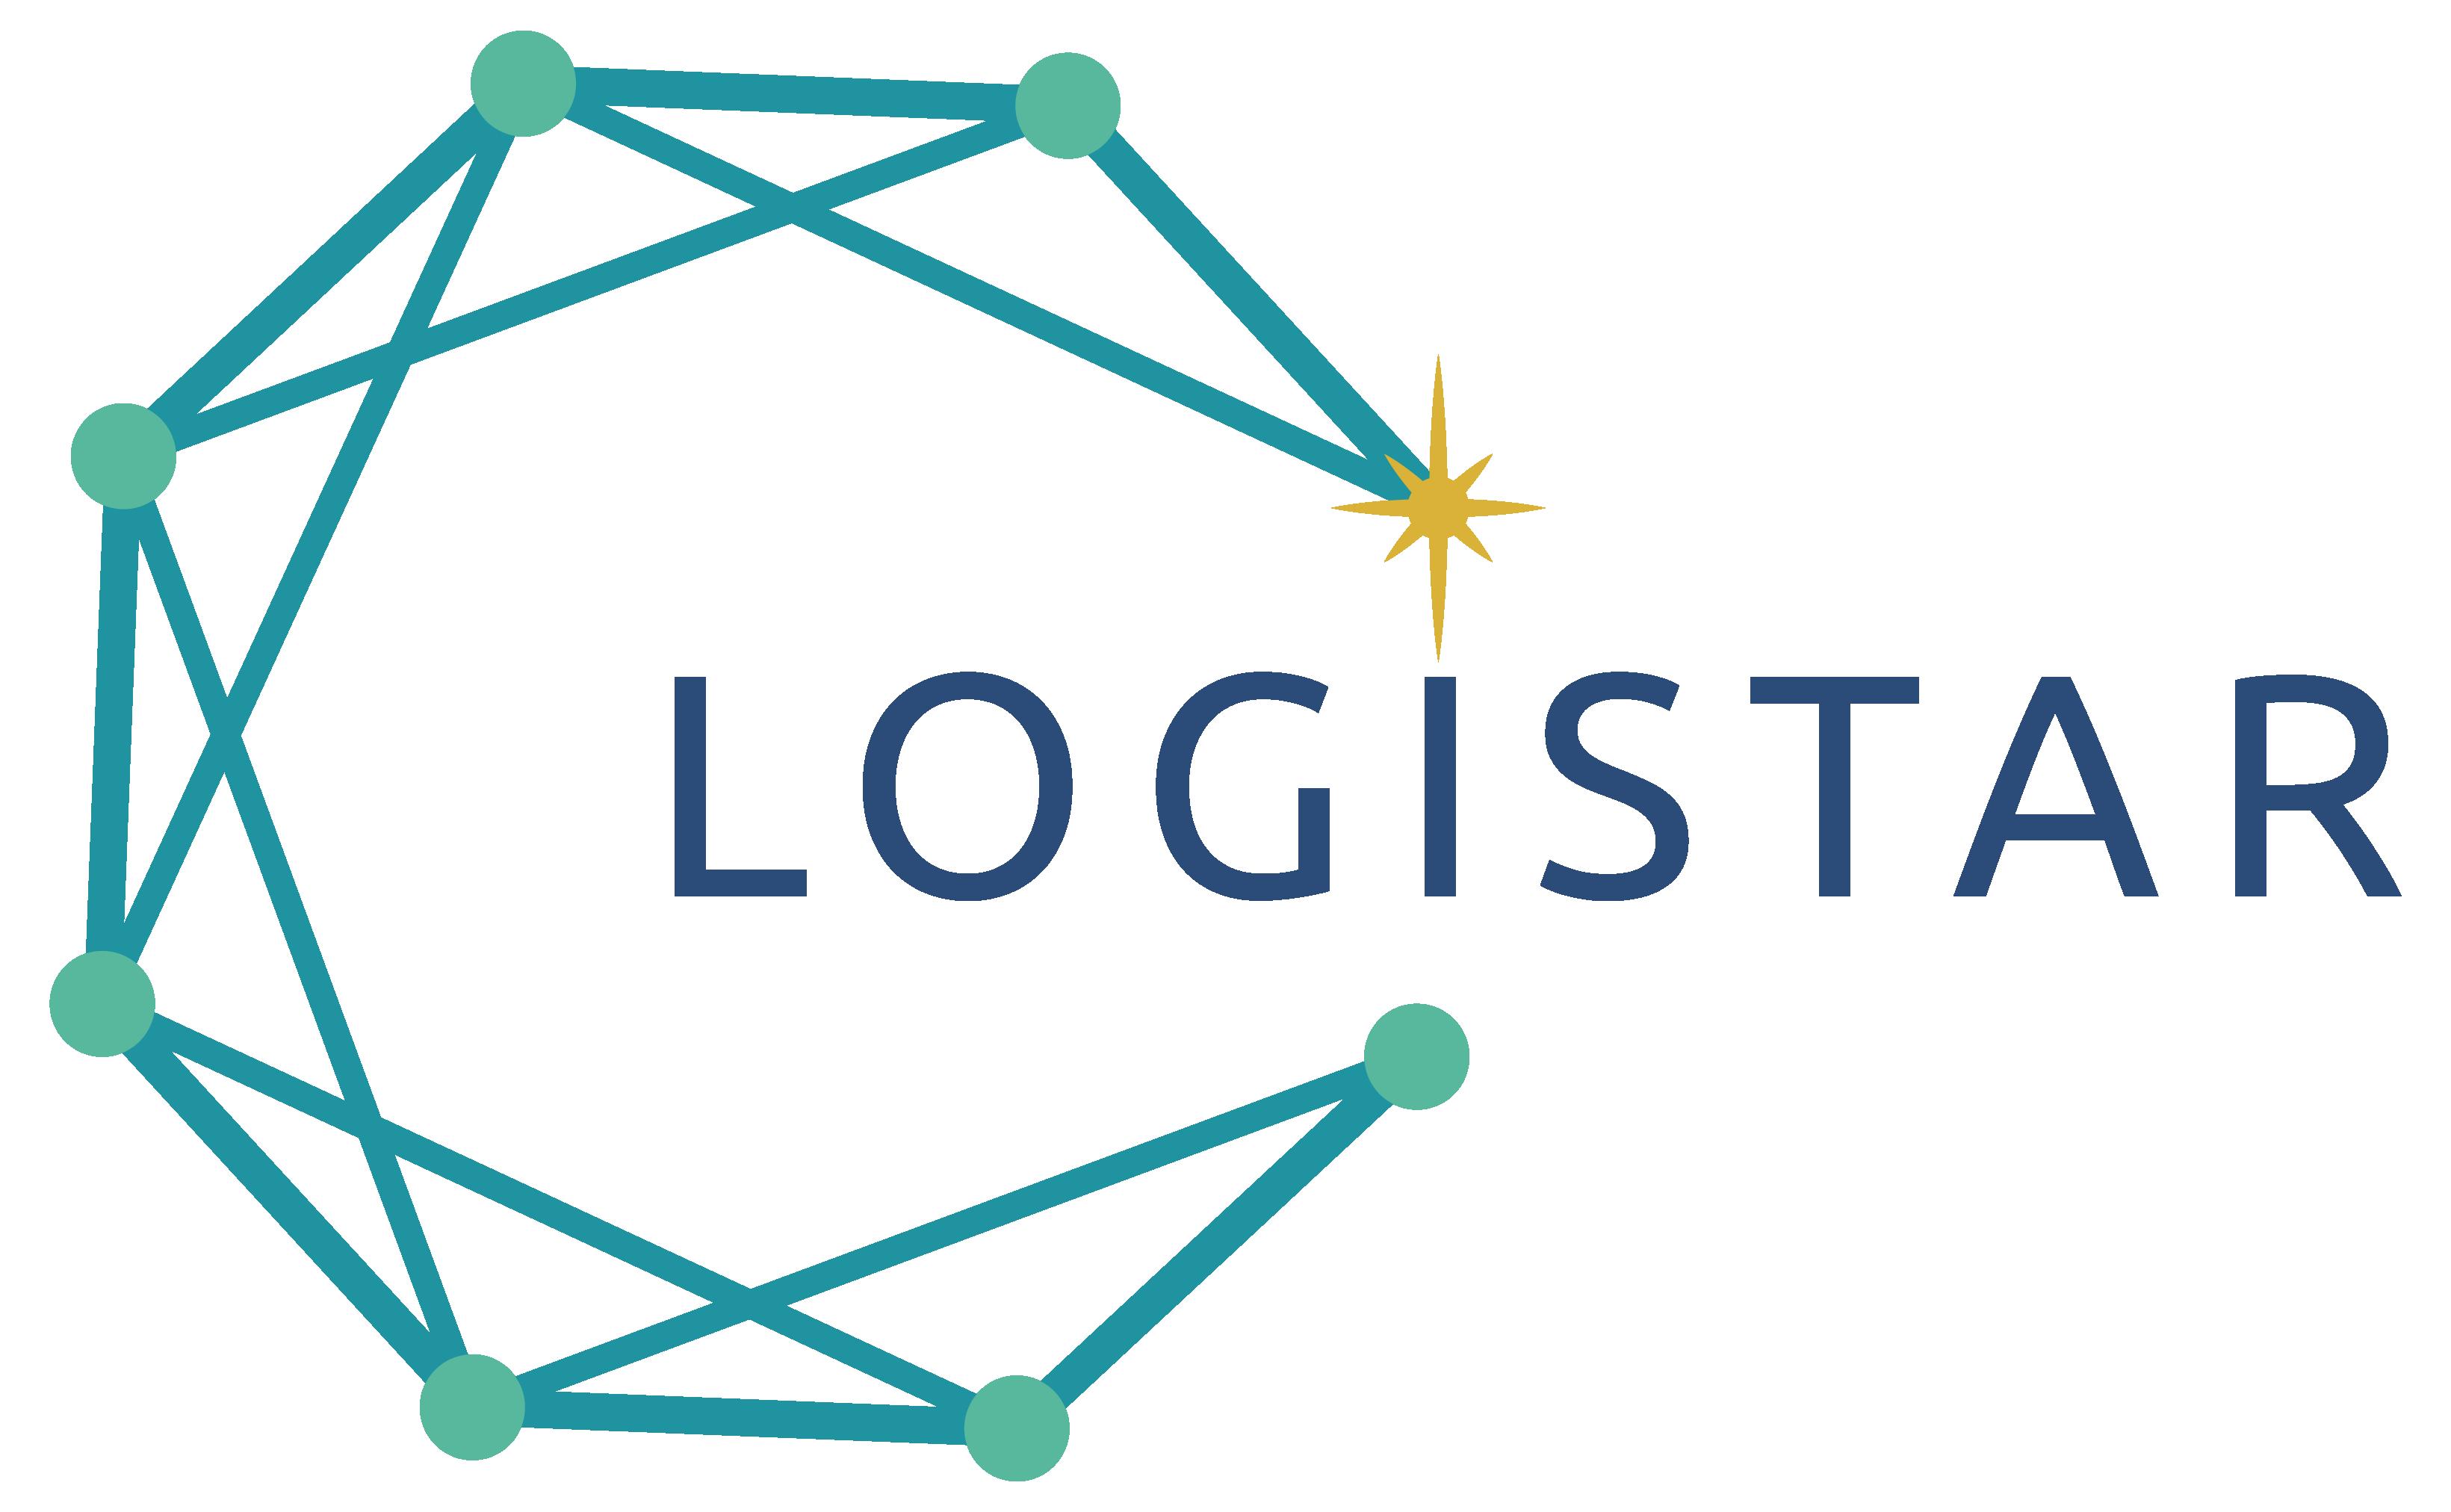 LOGO_LOGISTAR